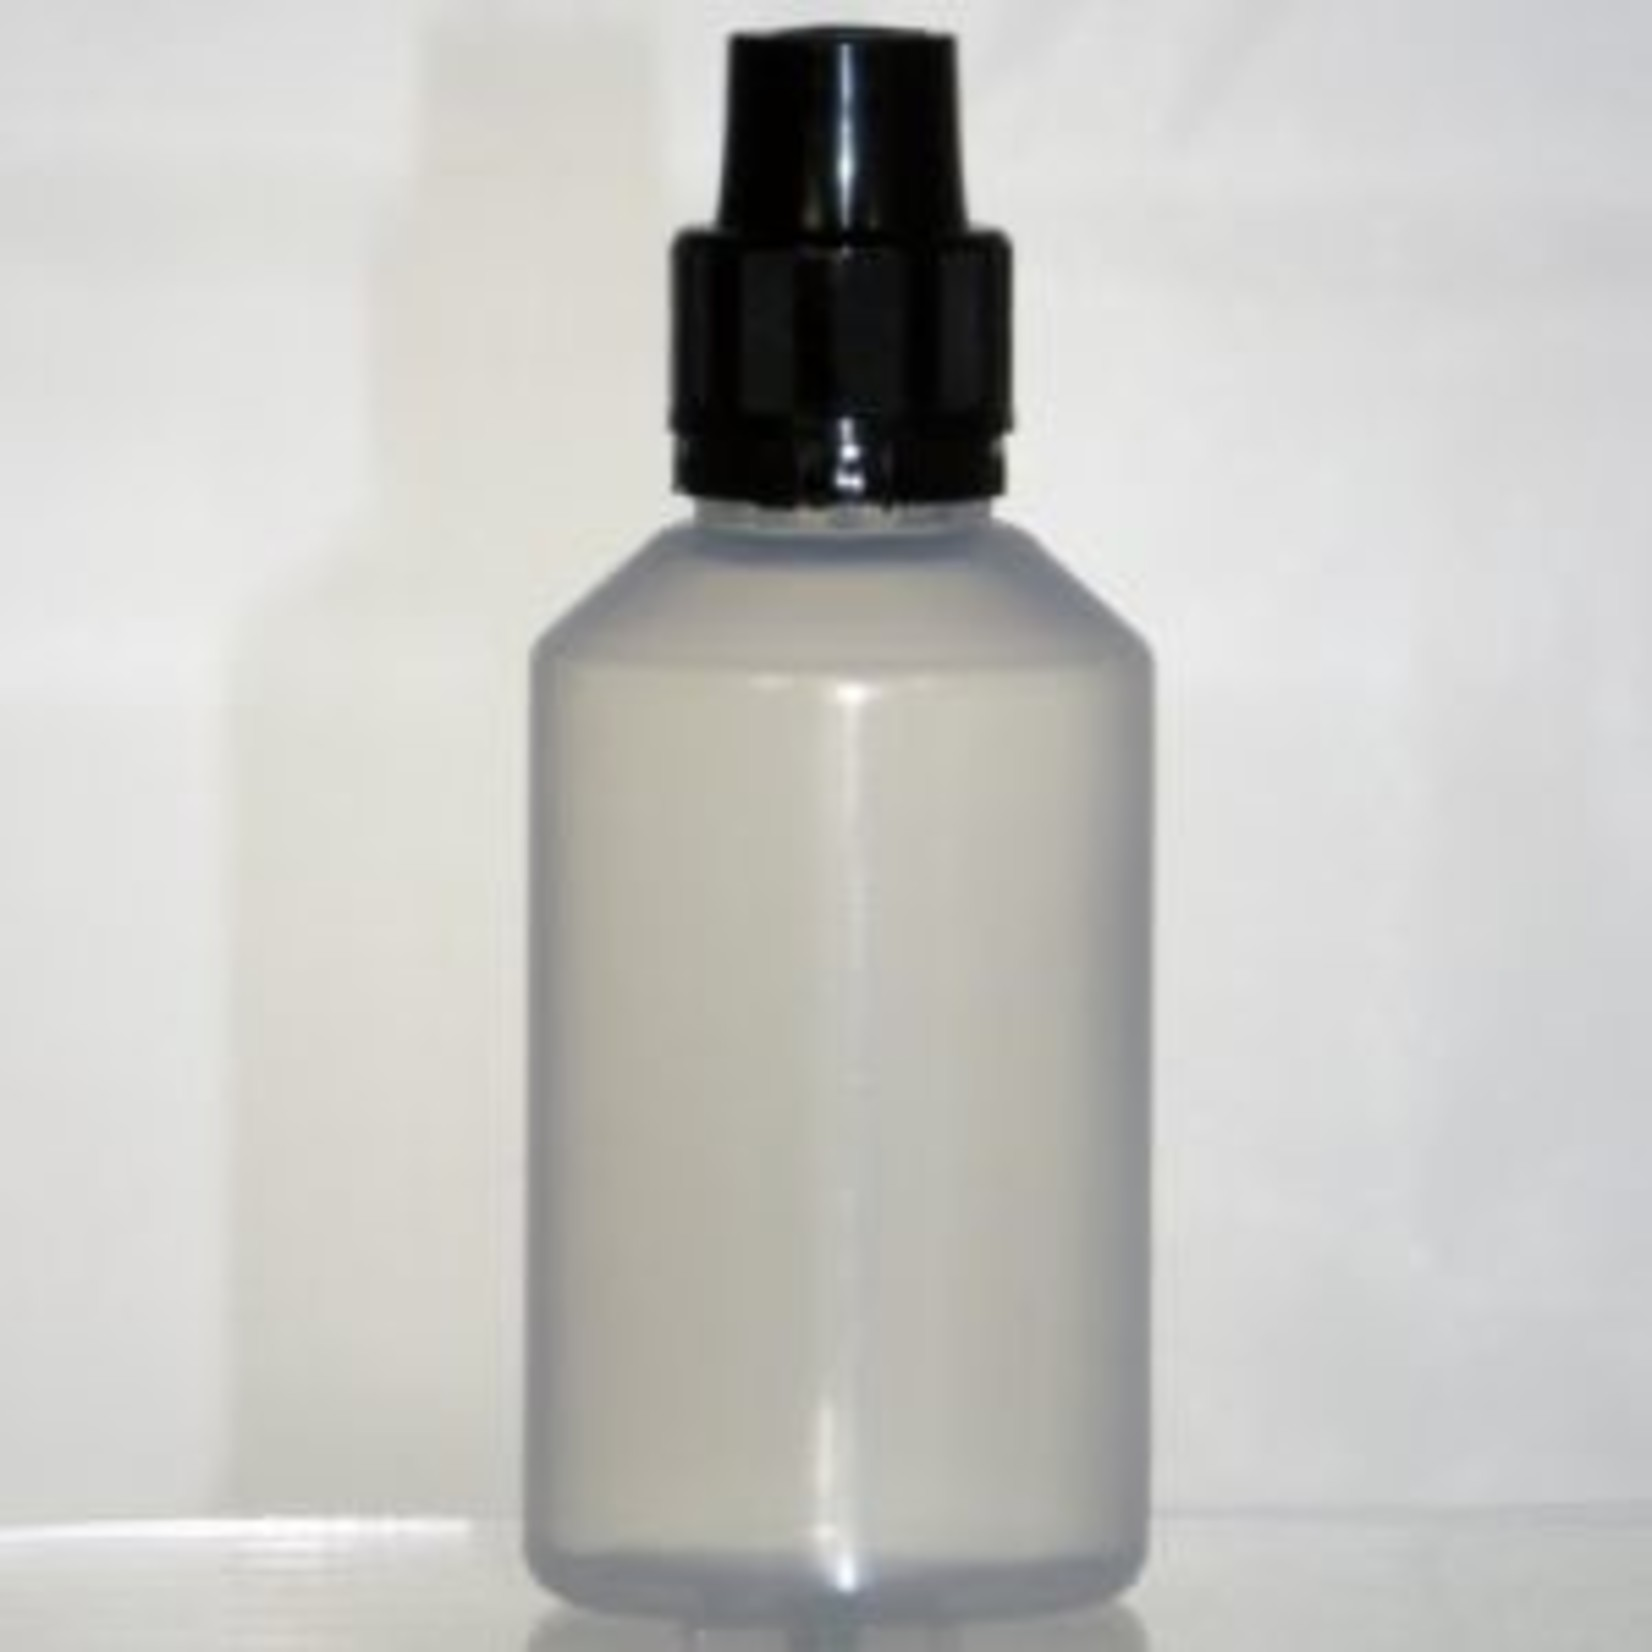 E-Liquid Flasche 50ml